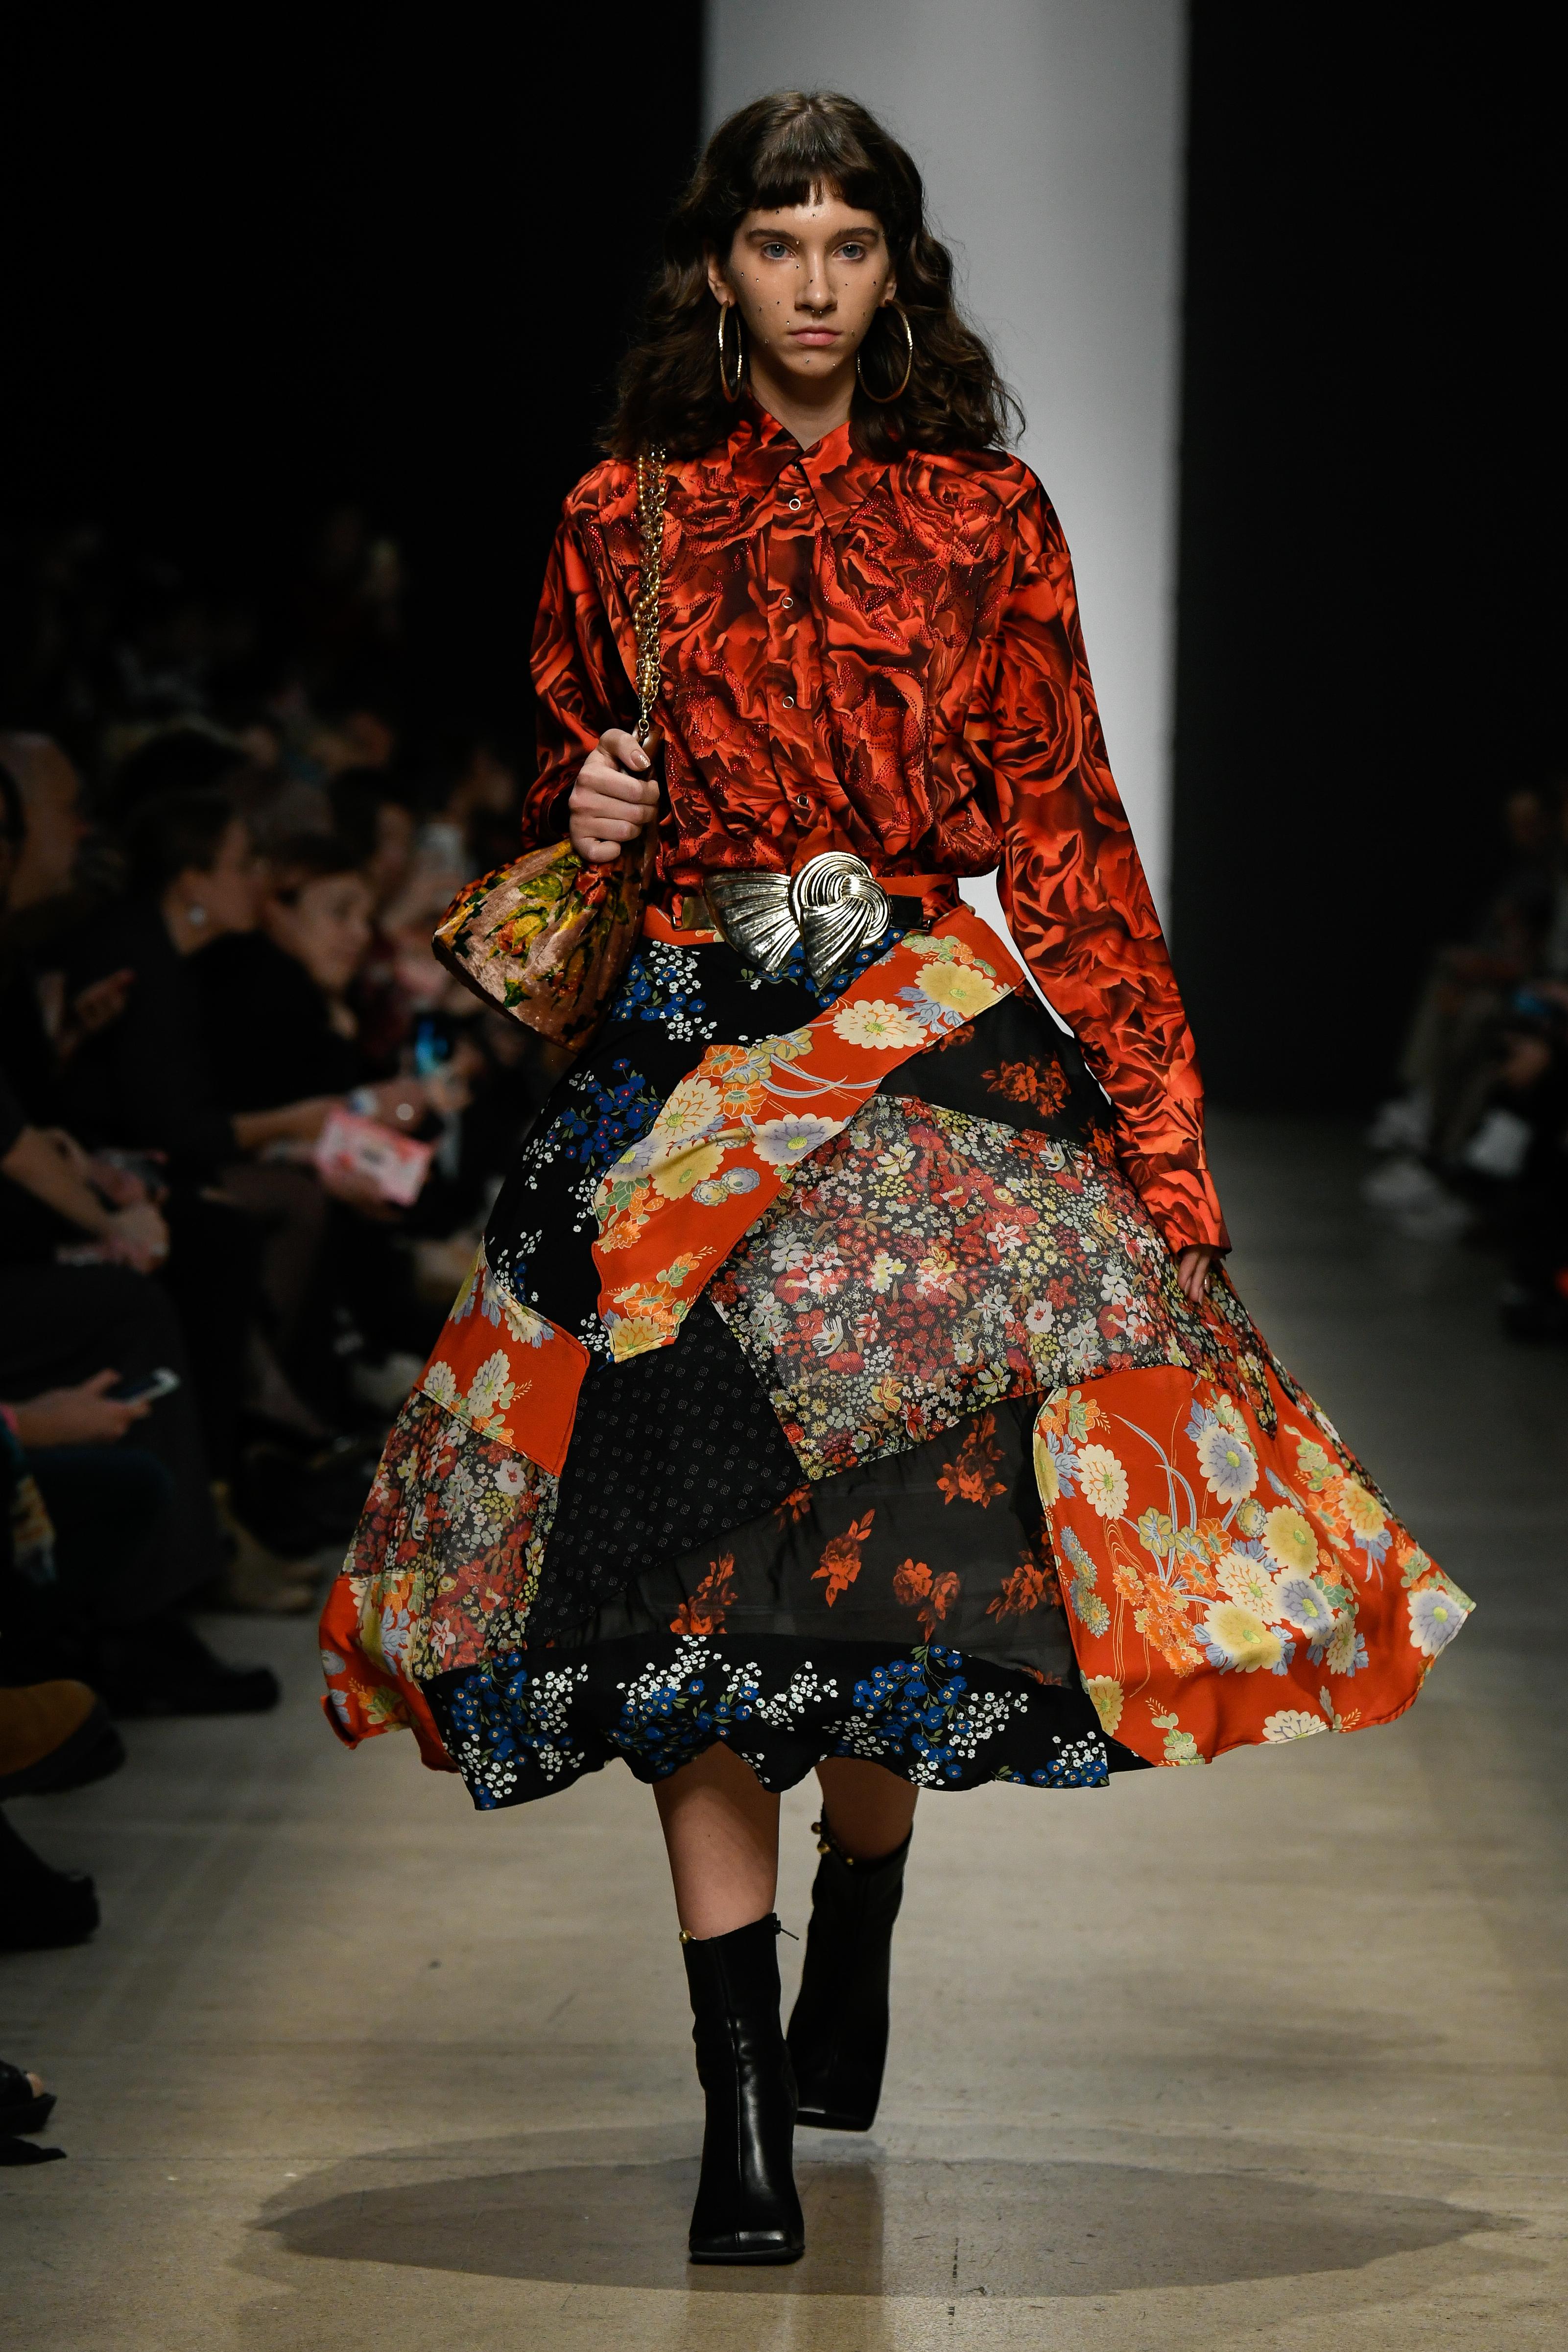 Фото: Mercedes-Benz Fashion Week Russia: Roma Uvarov Design весна-лето 2020